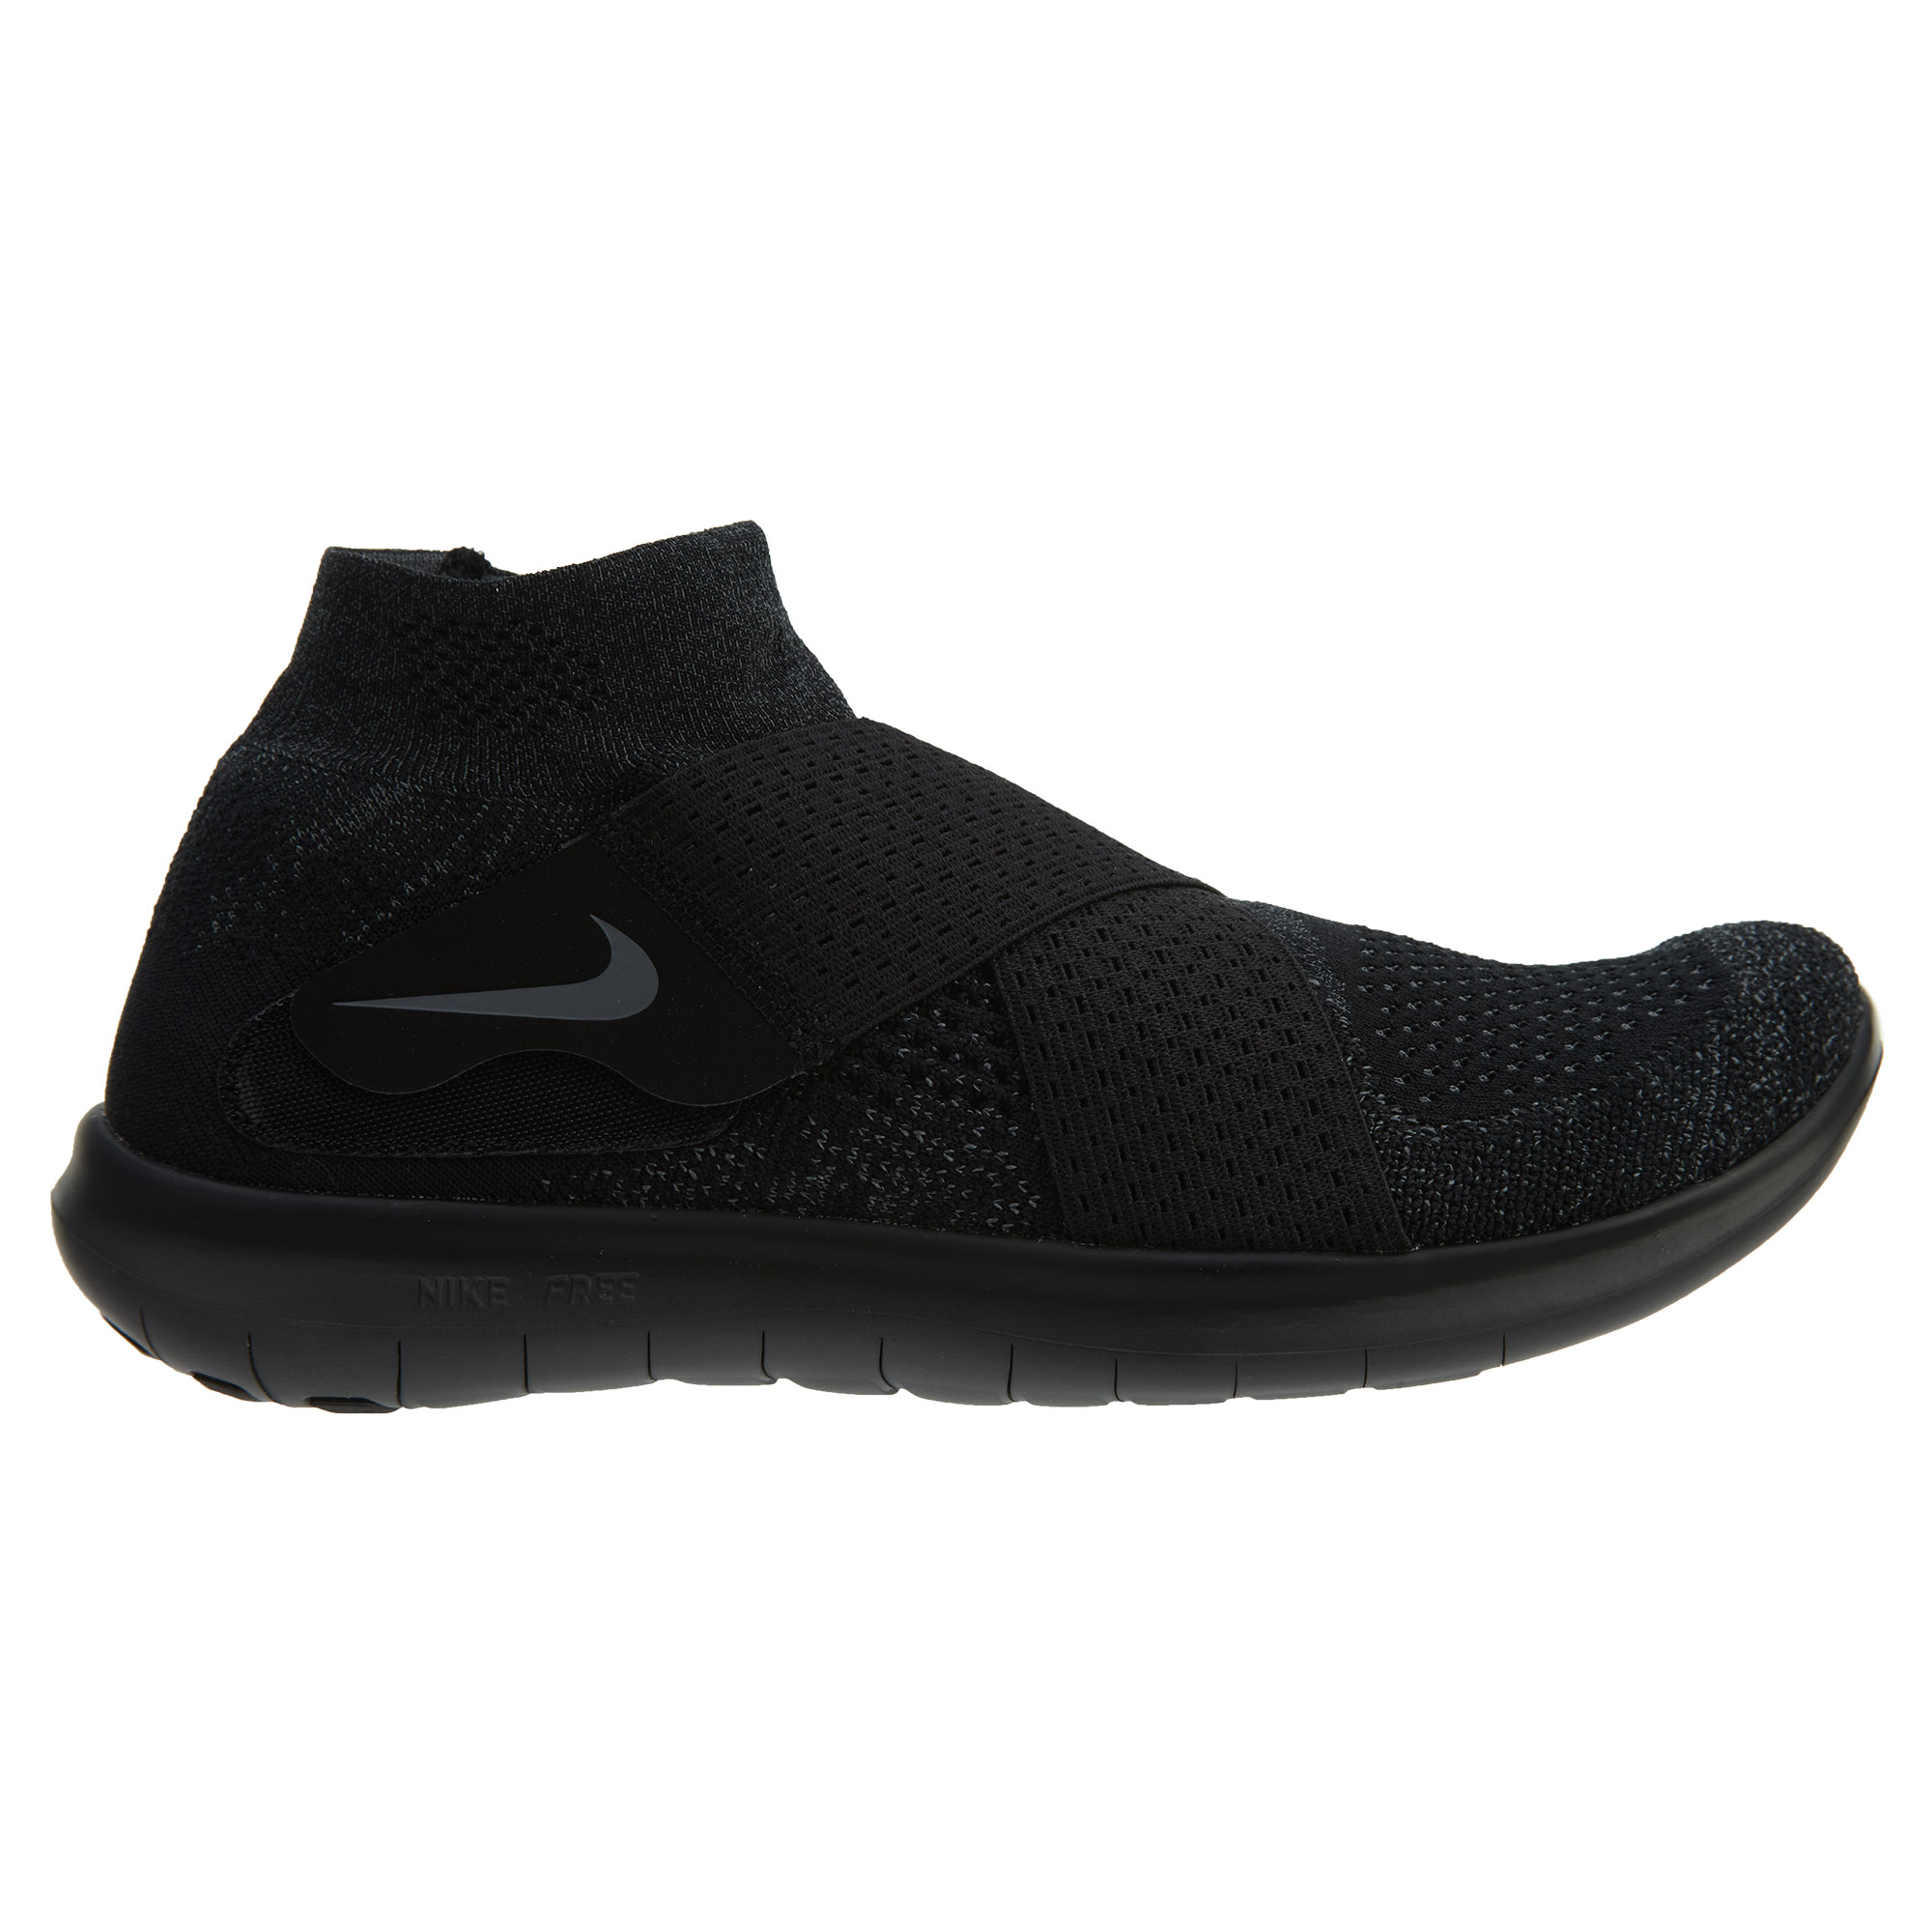 Nike Free Rn Motion Fk 2017 Black Dark